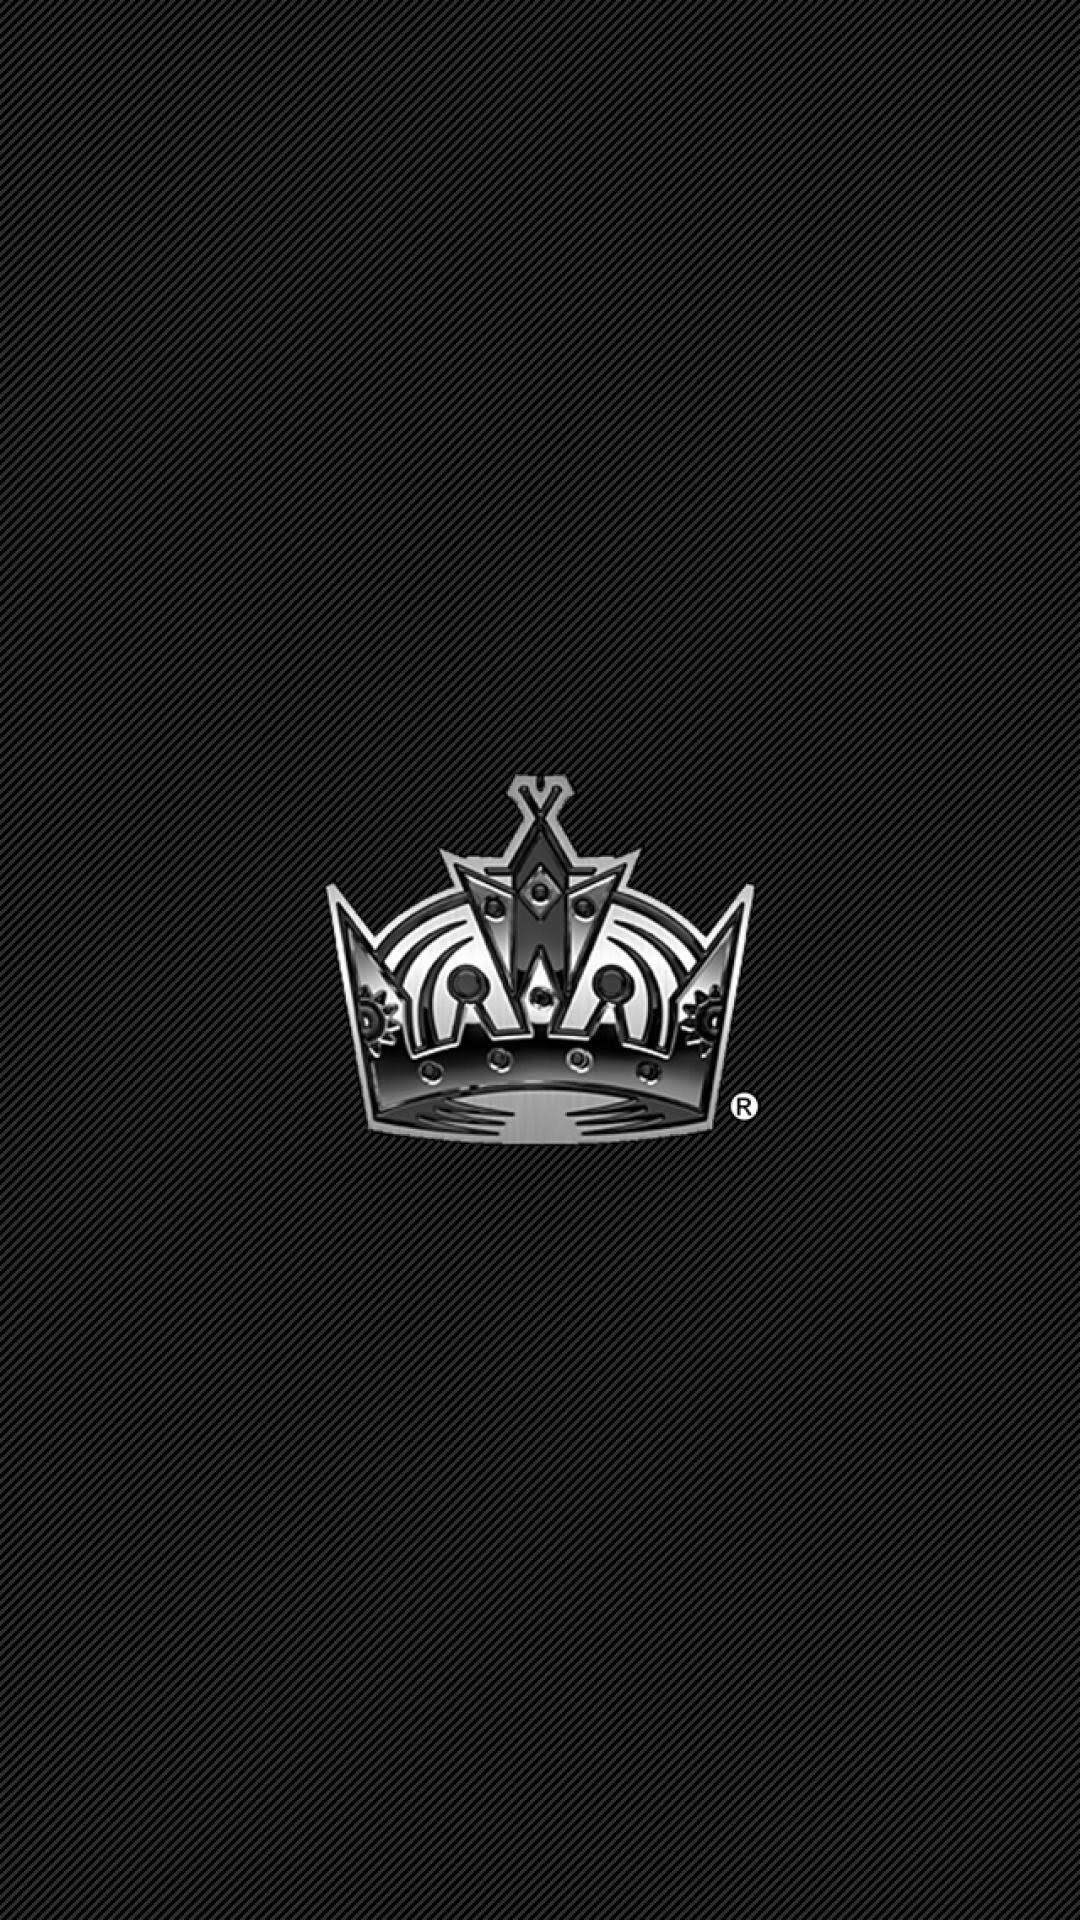 La Kings Wallpapers Hd 74 Images